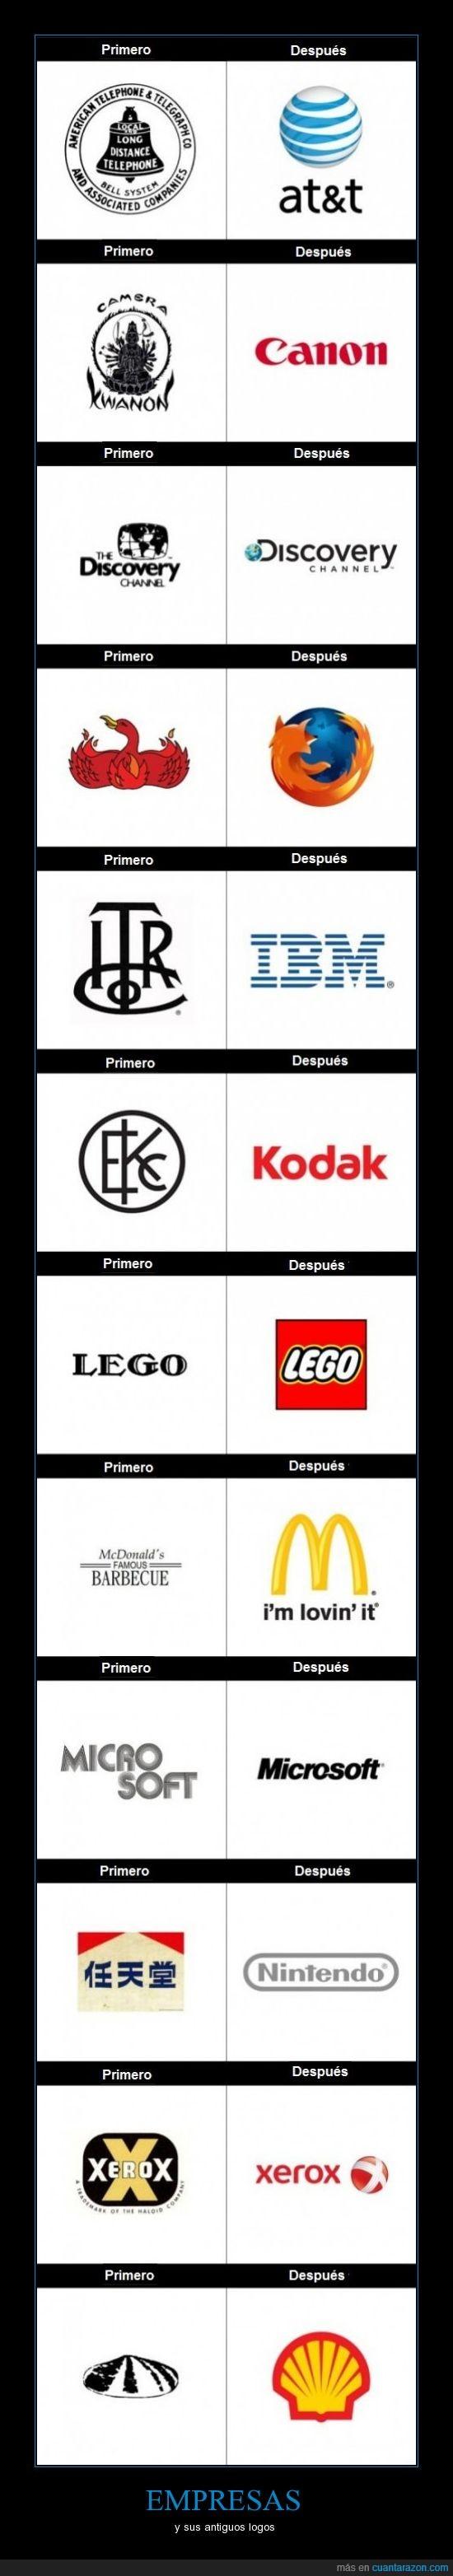 antiguos,AT&T,canon,discovery chanel,empresas,firefox,ibm,kodak,lego,logos,mcdonals,microsoft,nintendo,shell,xerox